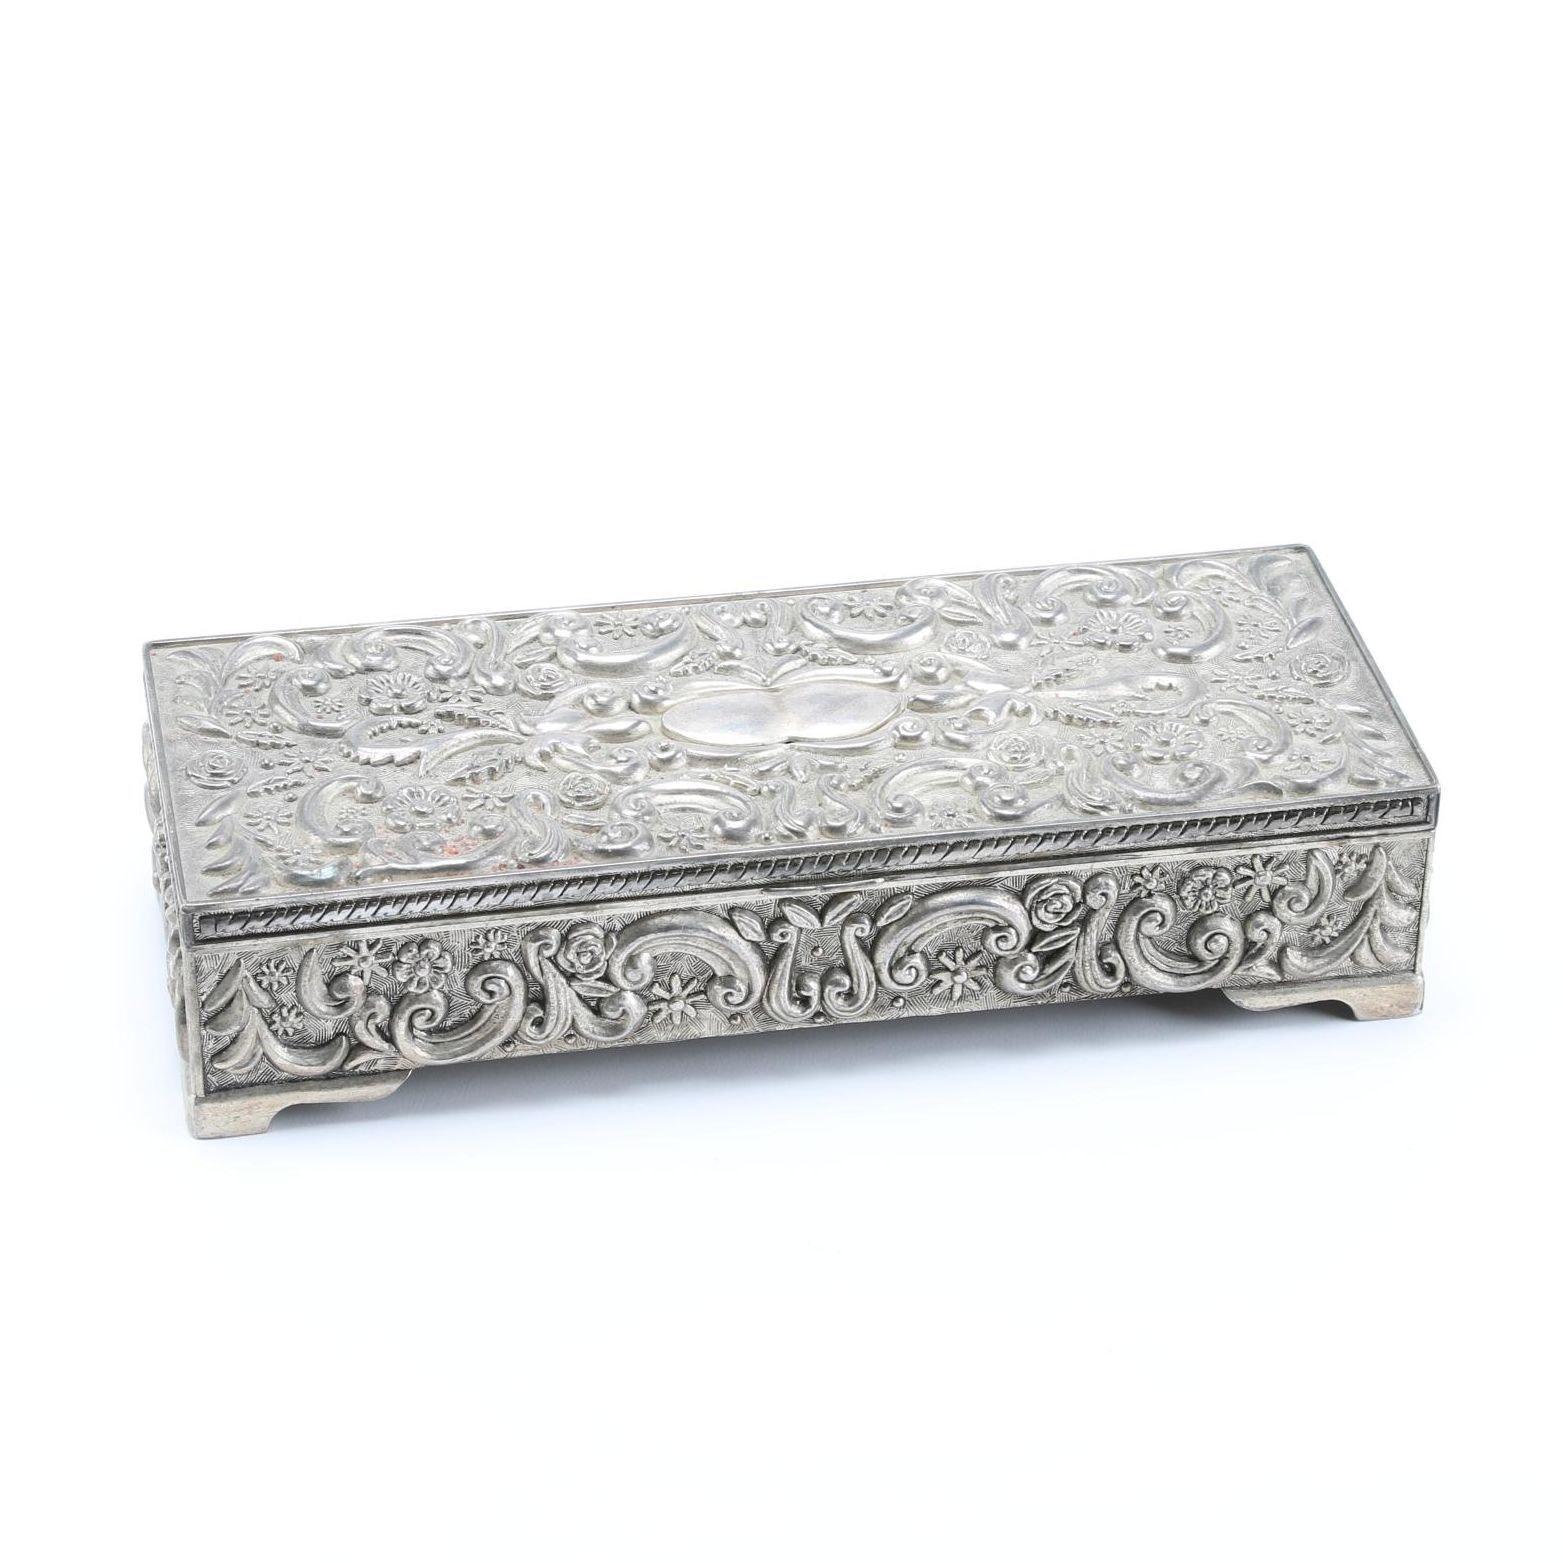 Godinger Silver Plate Jewelry Box